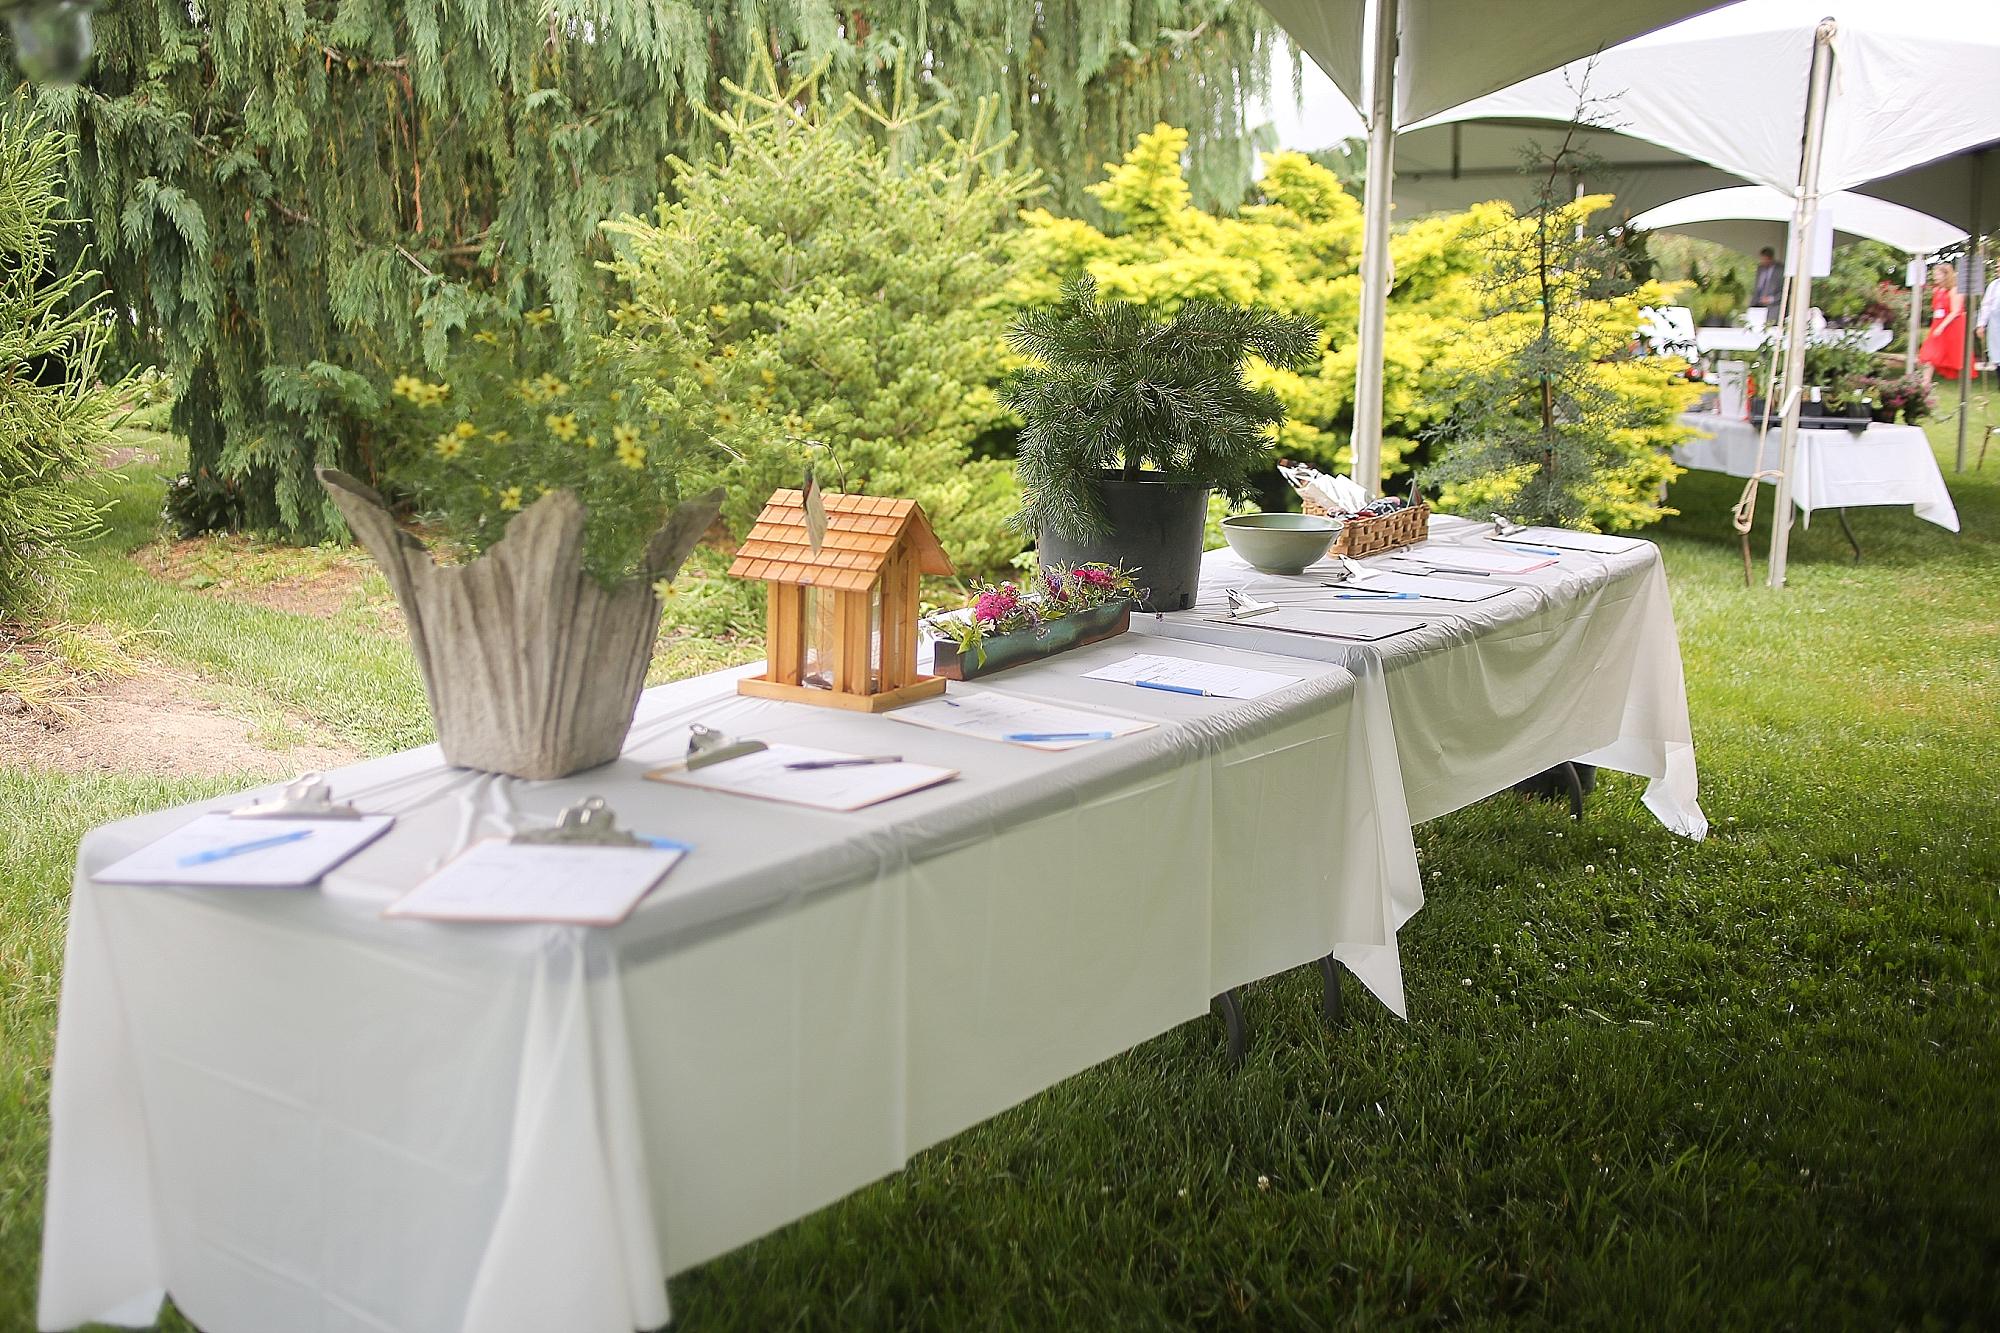 Hahn-Horticulture-Garden-Gala-2018-Virginia-Tech-Blacksburg-Photographers_0026.jpg